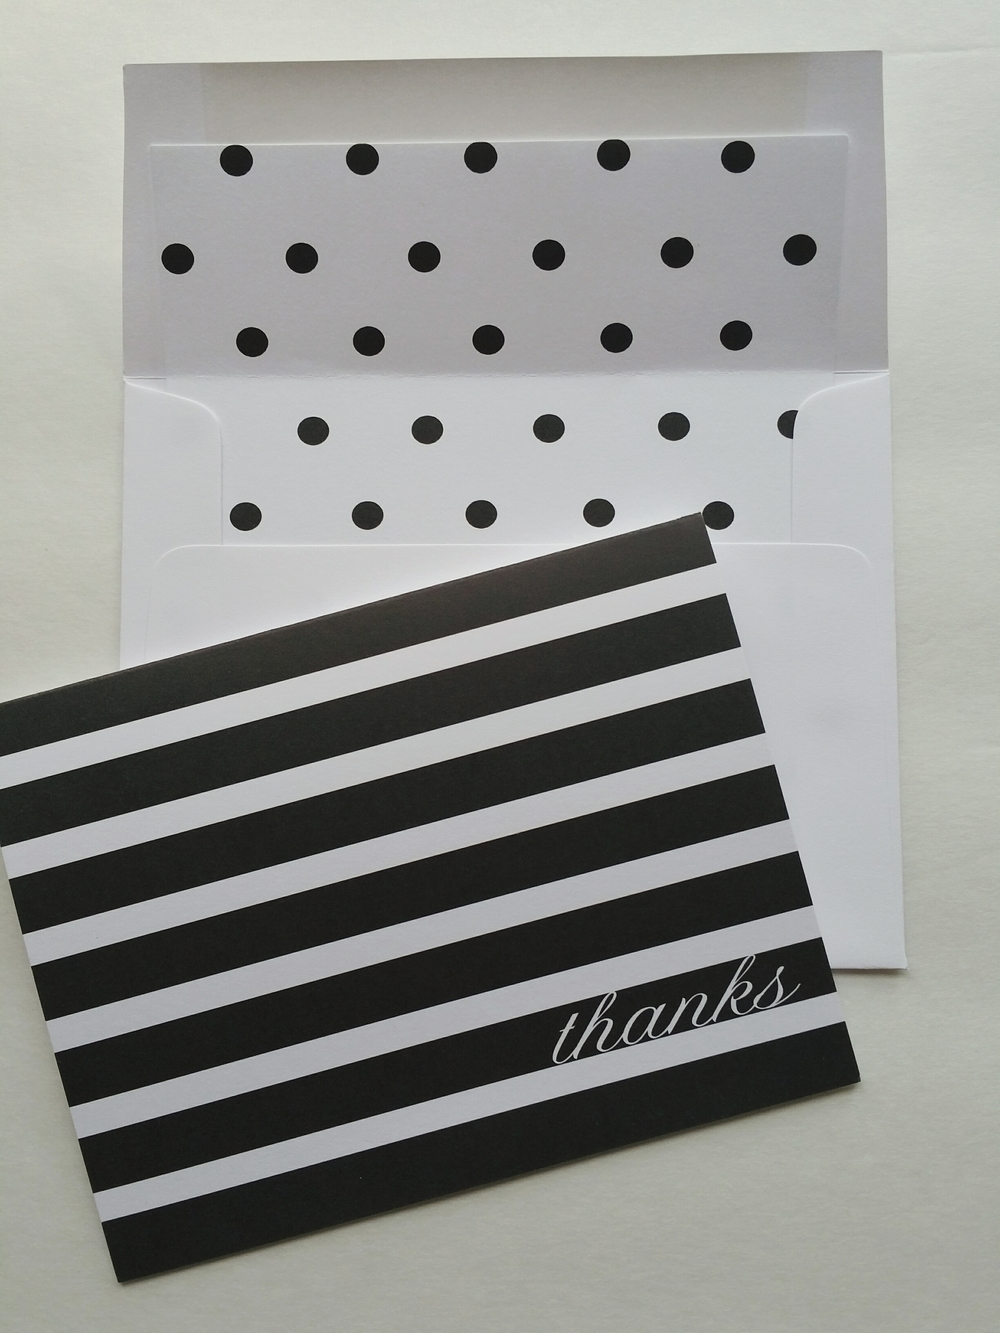 Paper Dreams LLC | Http://www.paperdreamsllc.com | New York Stationery Designer | Stripes and Polka Dot Note Card Set